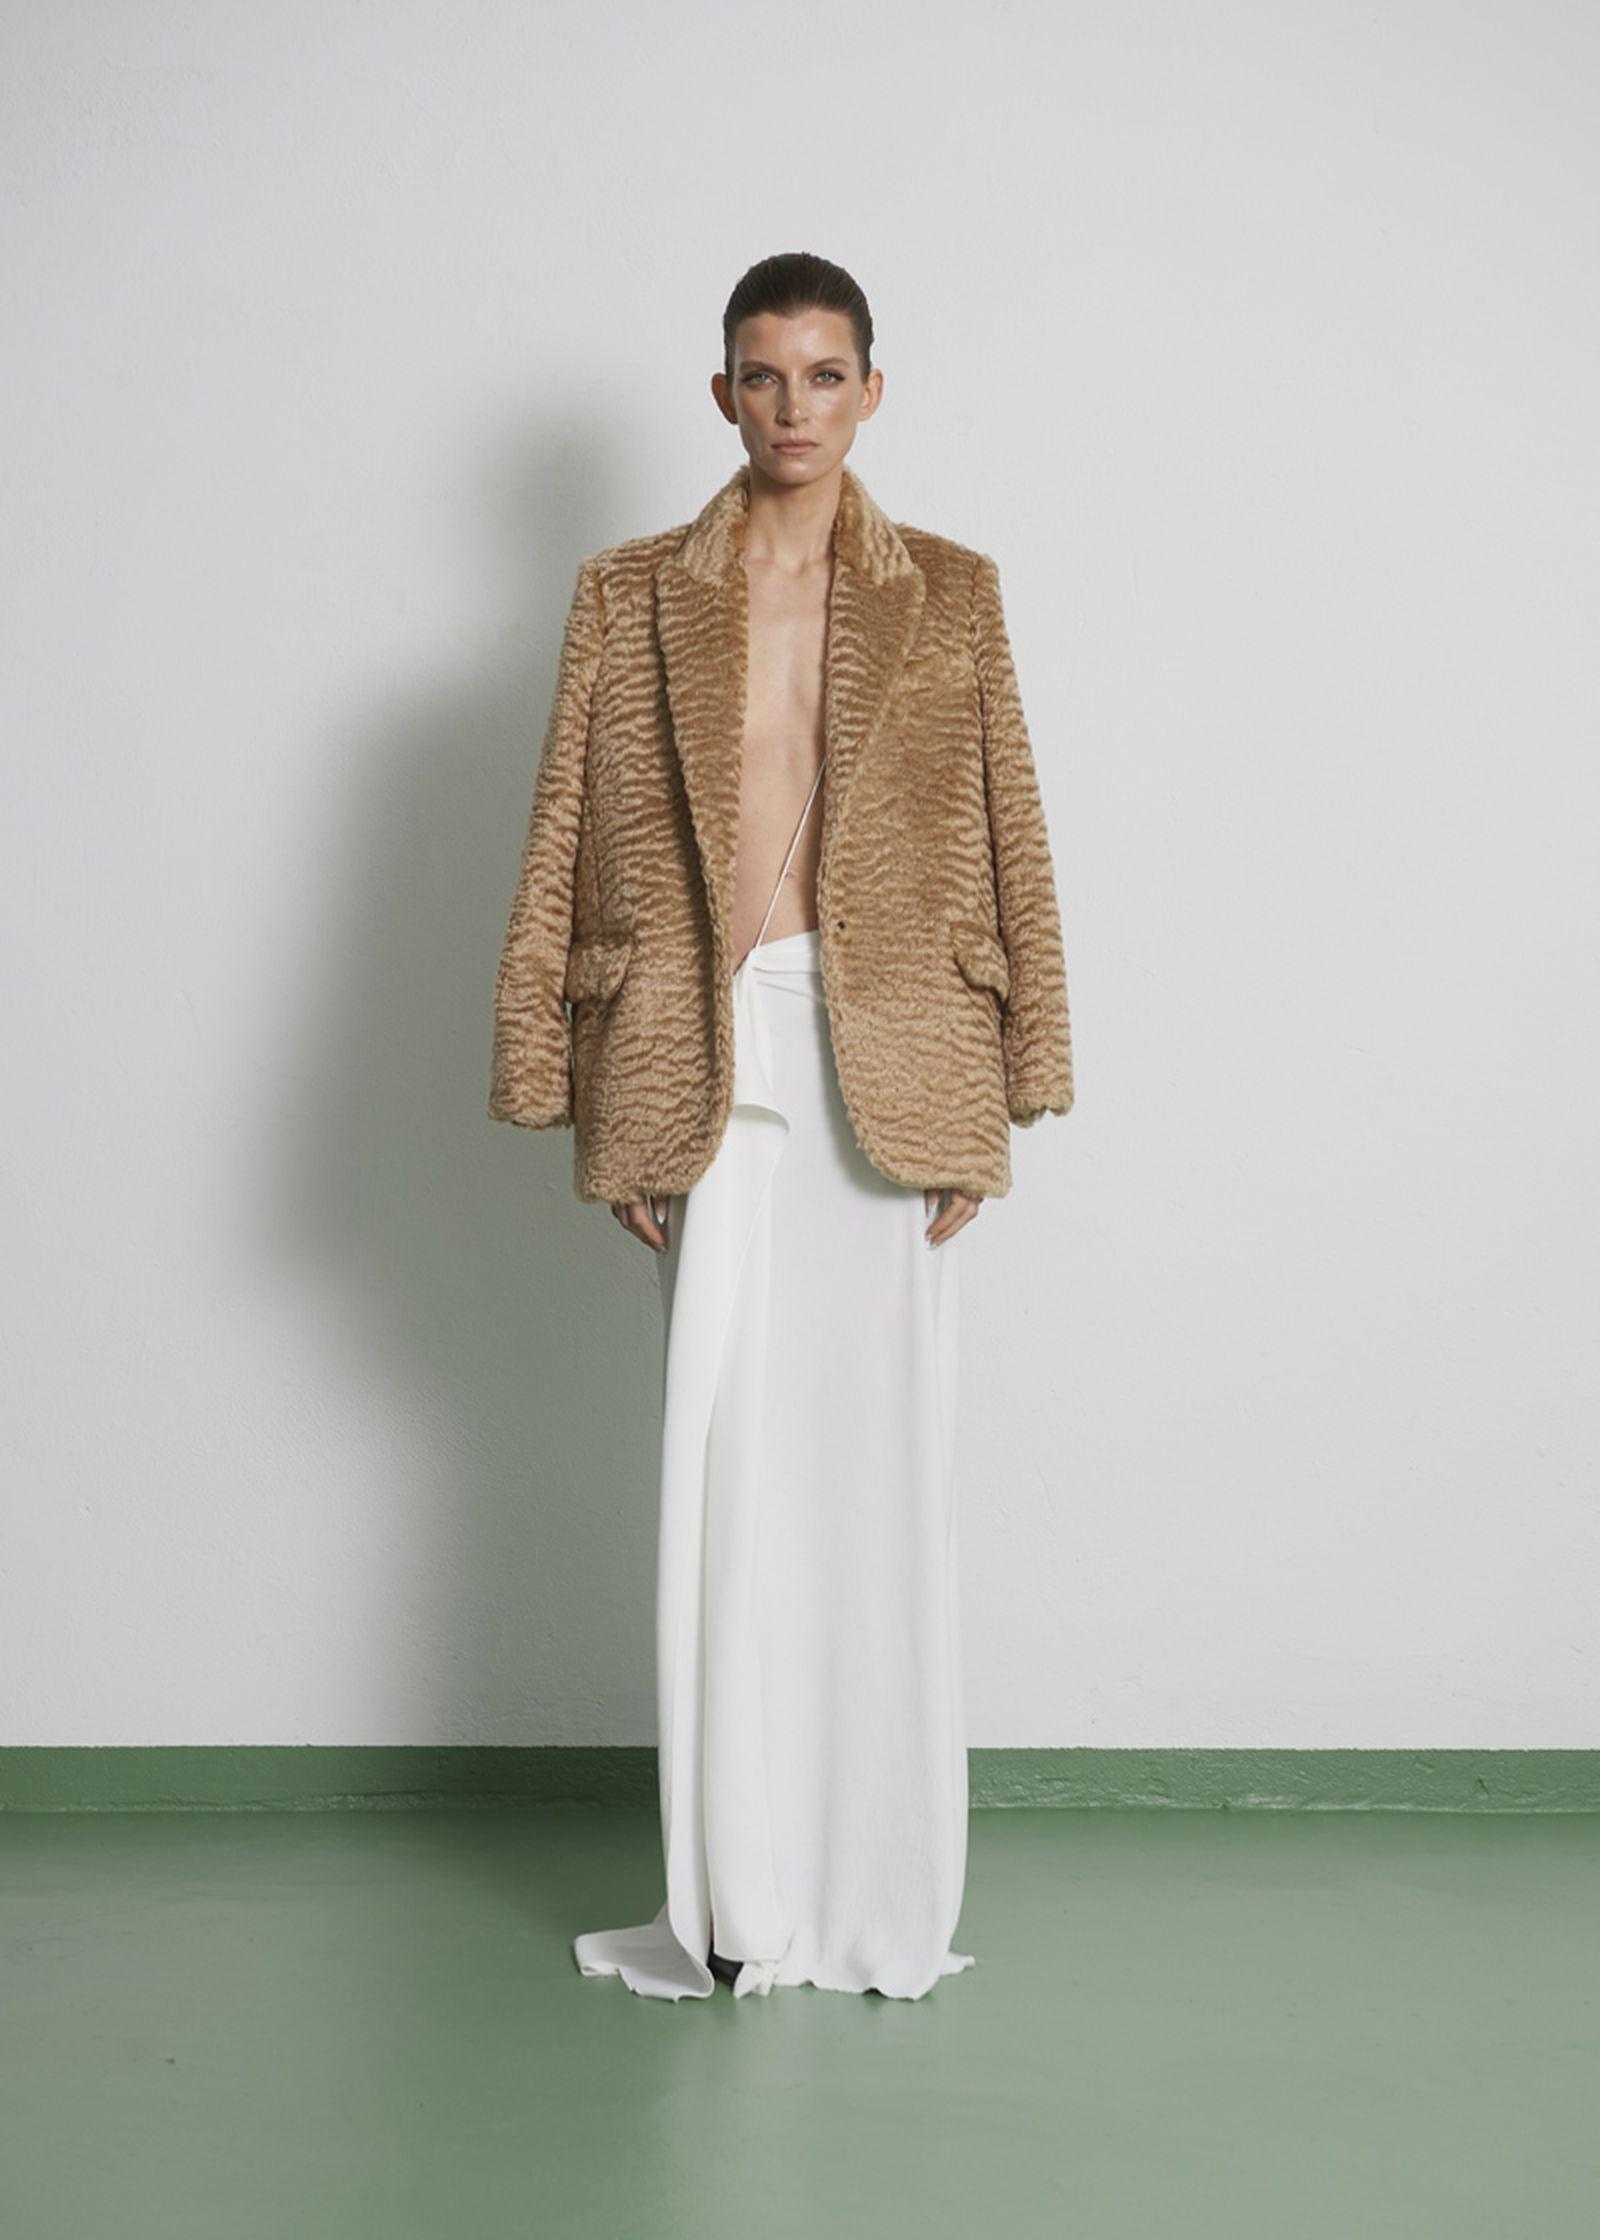 032c-rtw-womenswear-collection-paris-2